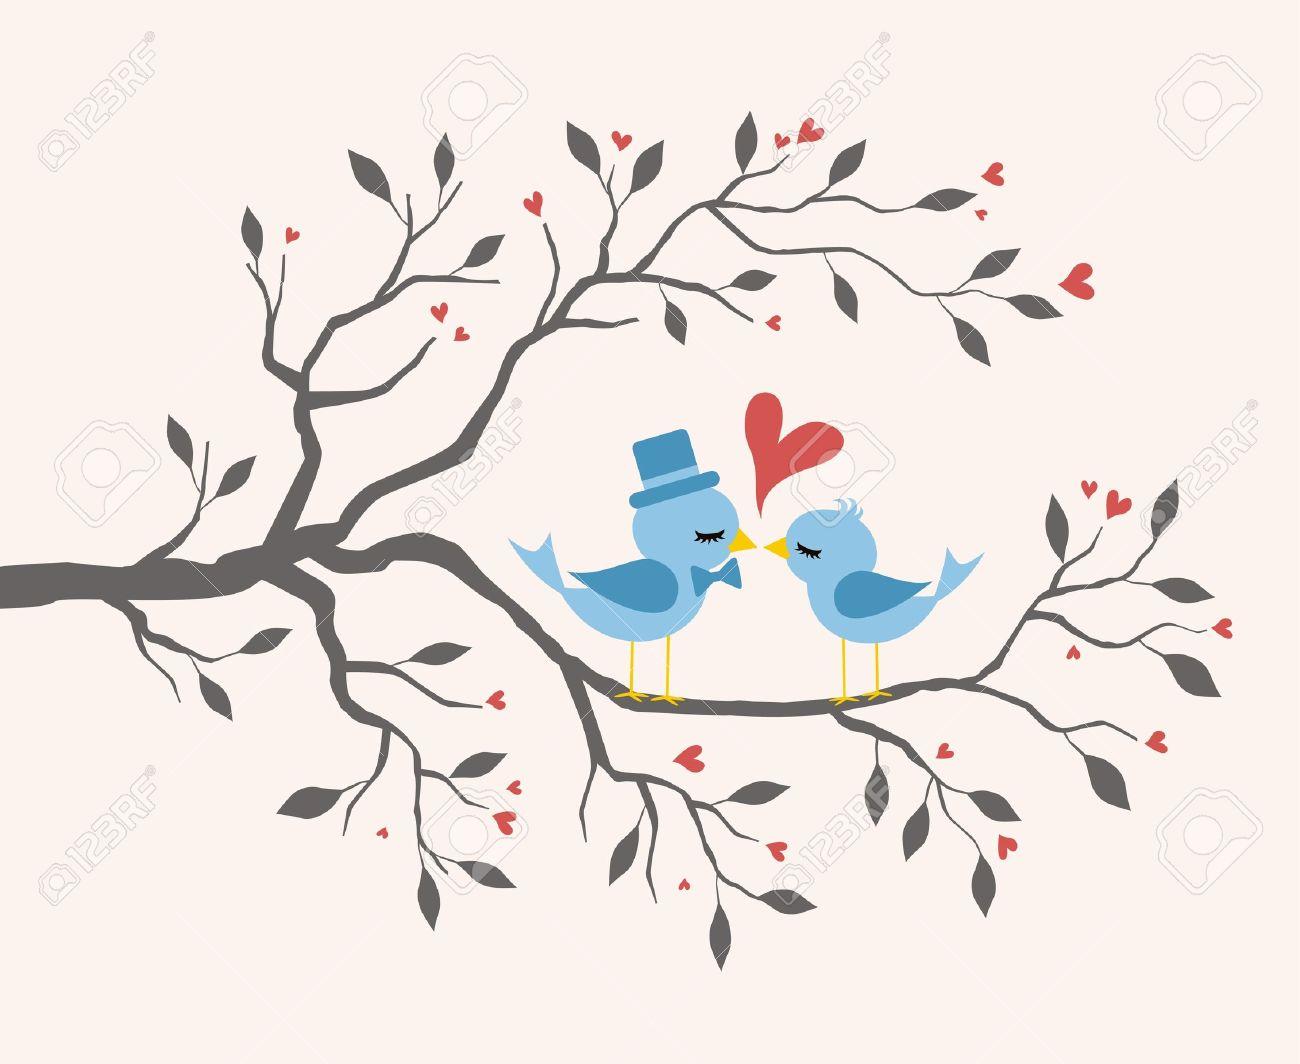 Kissing Birds in love at branch Stock Vector - 15420647